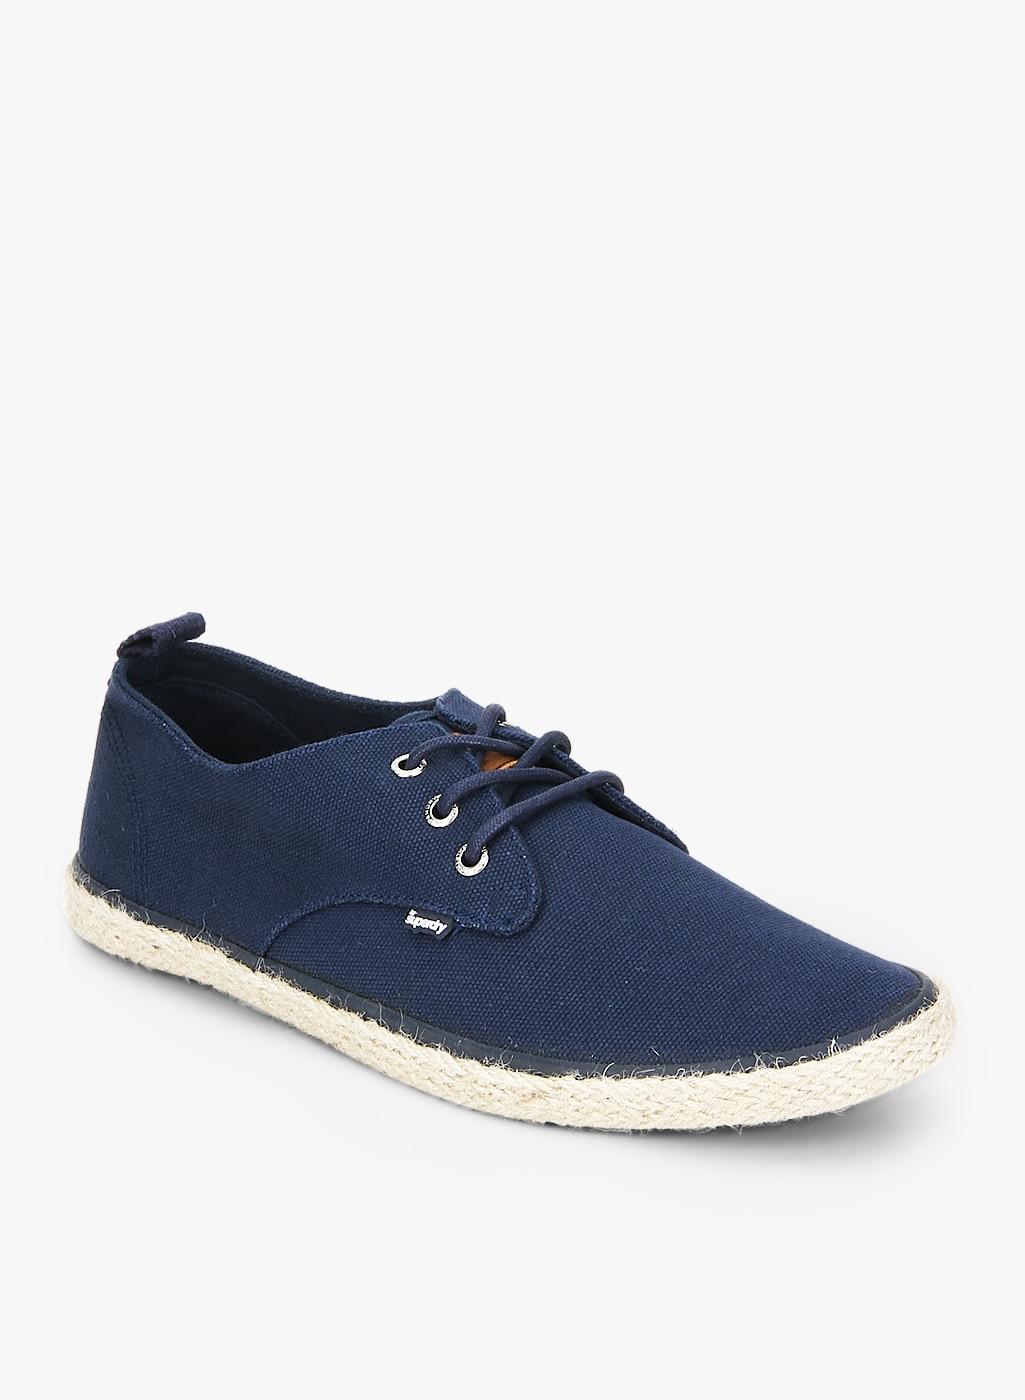 4a54b21c4543 Sneakers for Men - Buy Men Sneakers Shoes Online - Myntra